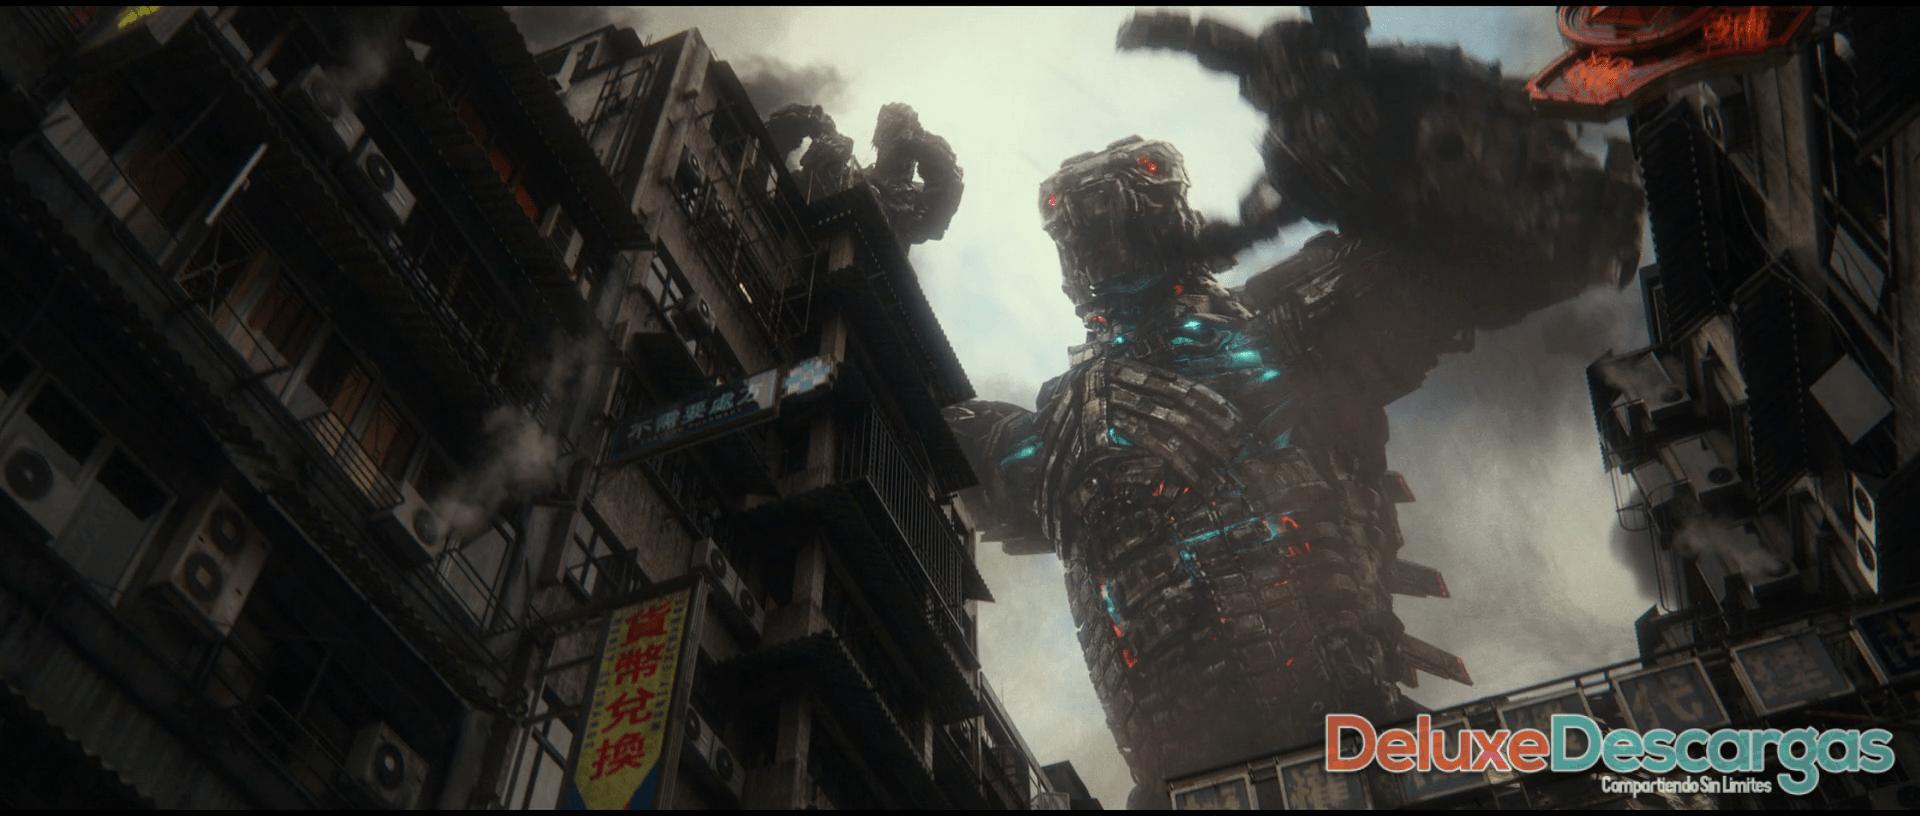 Godzilla vs Kong 1080p (7) min